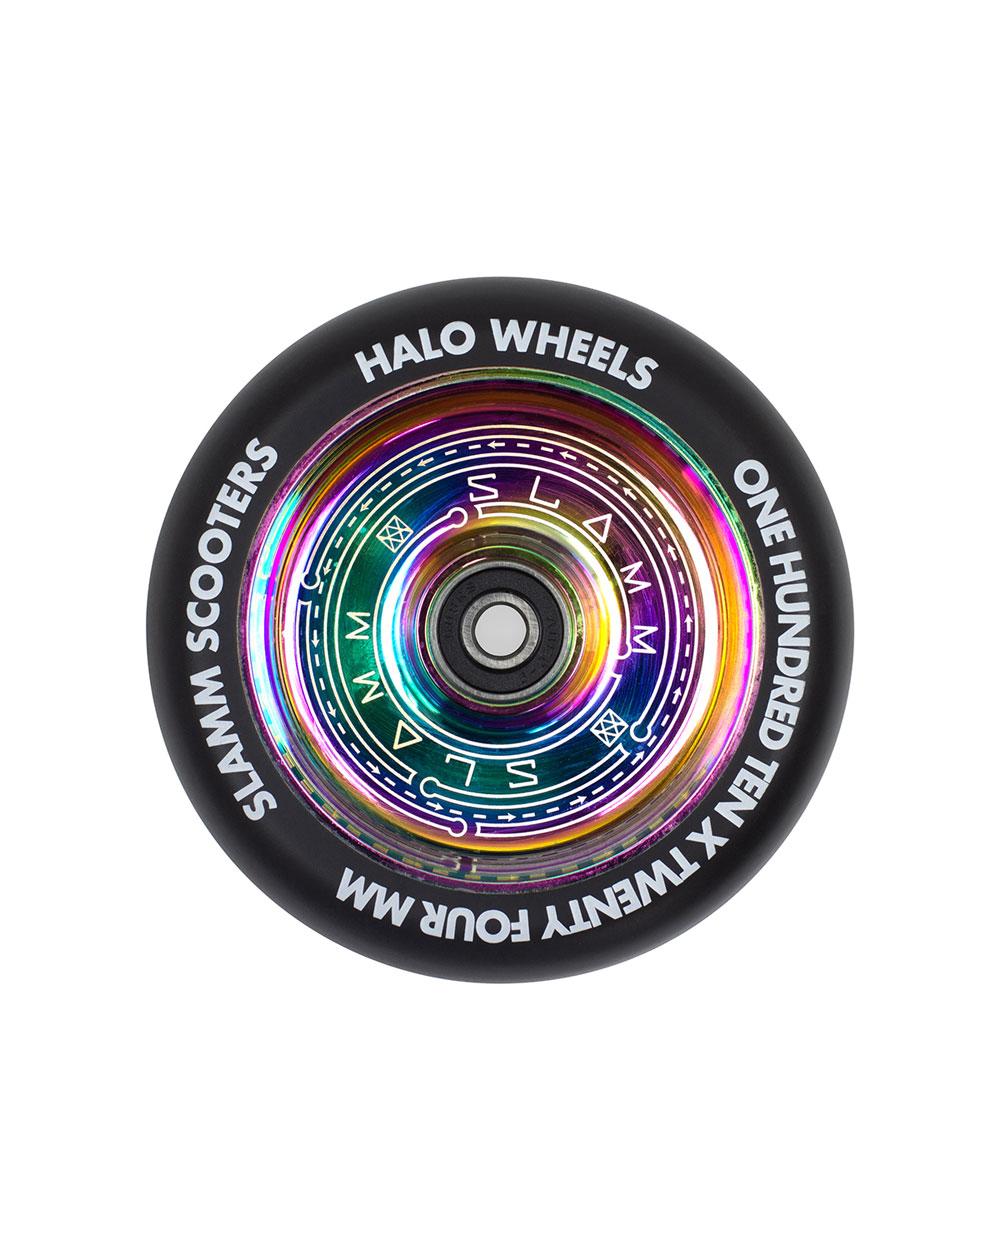 Slamm Scooters Ruota Monopattino Neochrome 110mm Halo Deep Dish